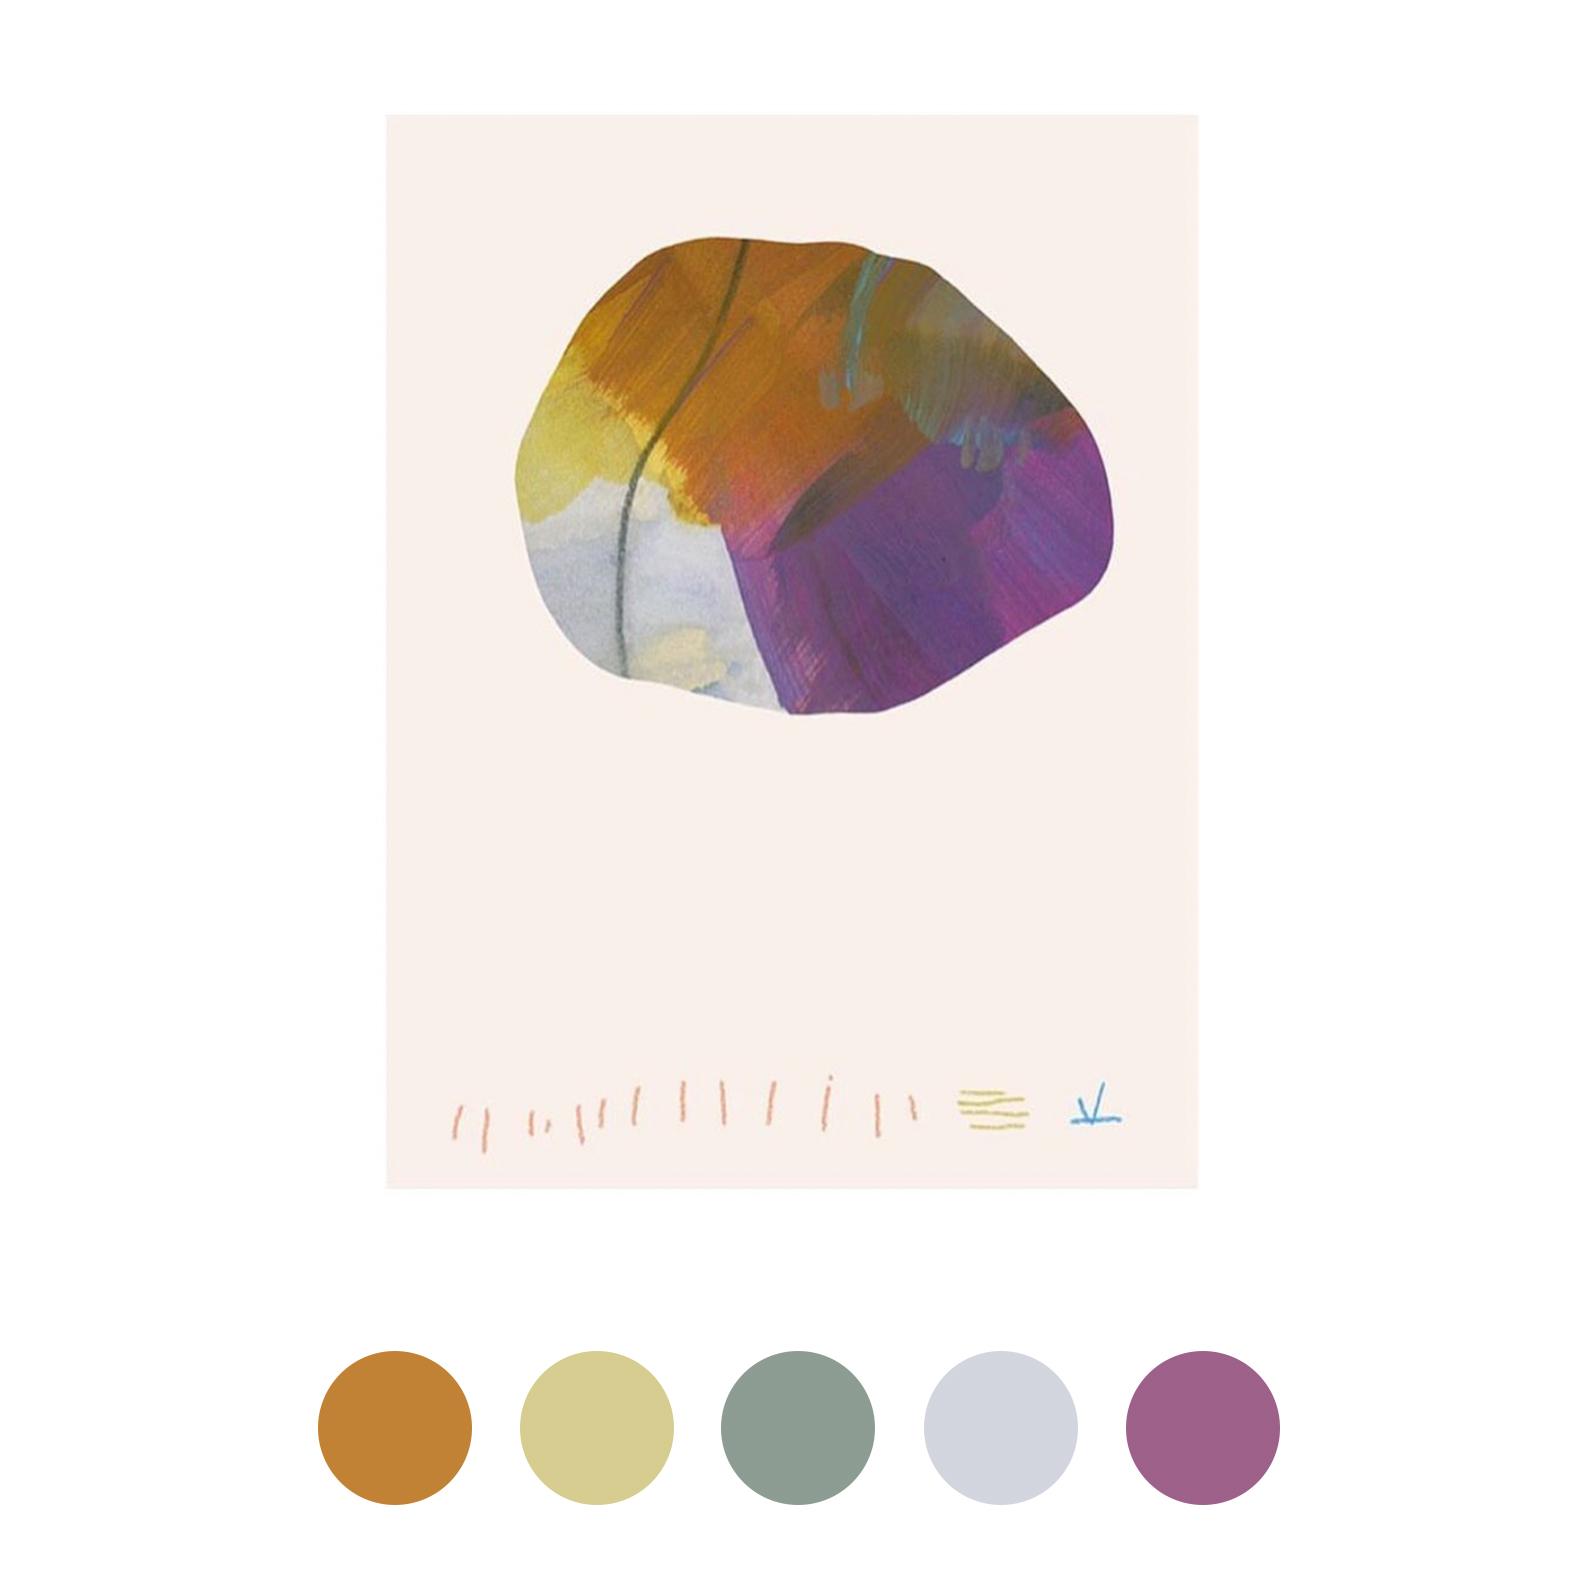 kelly_knaga_color_collective